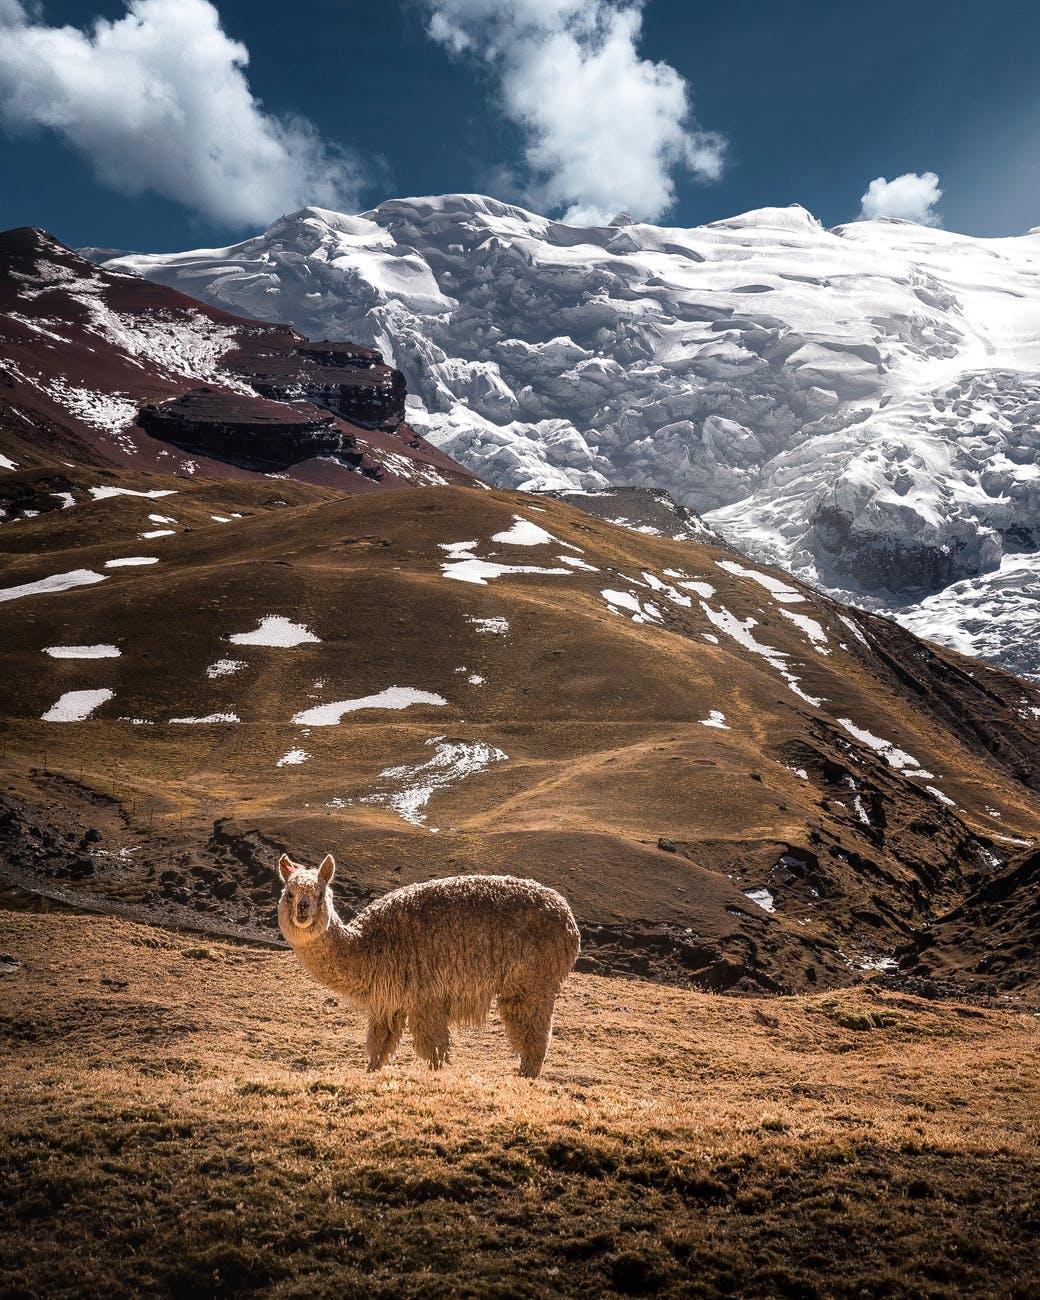 photo of llama during daytime